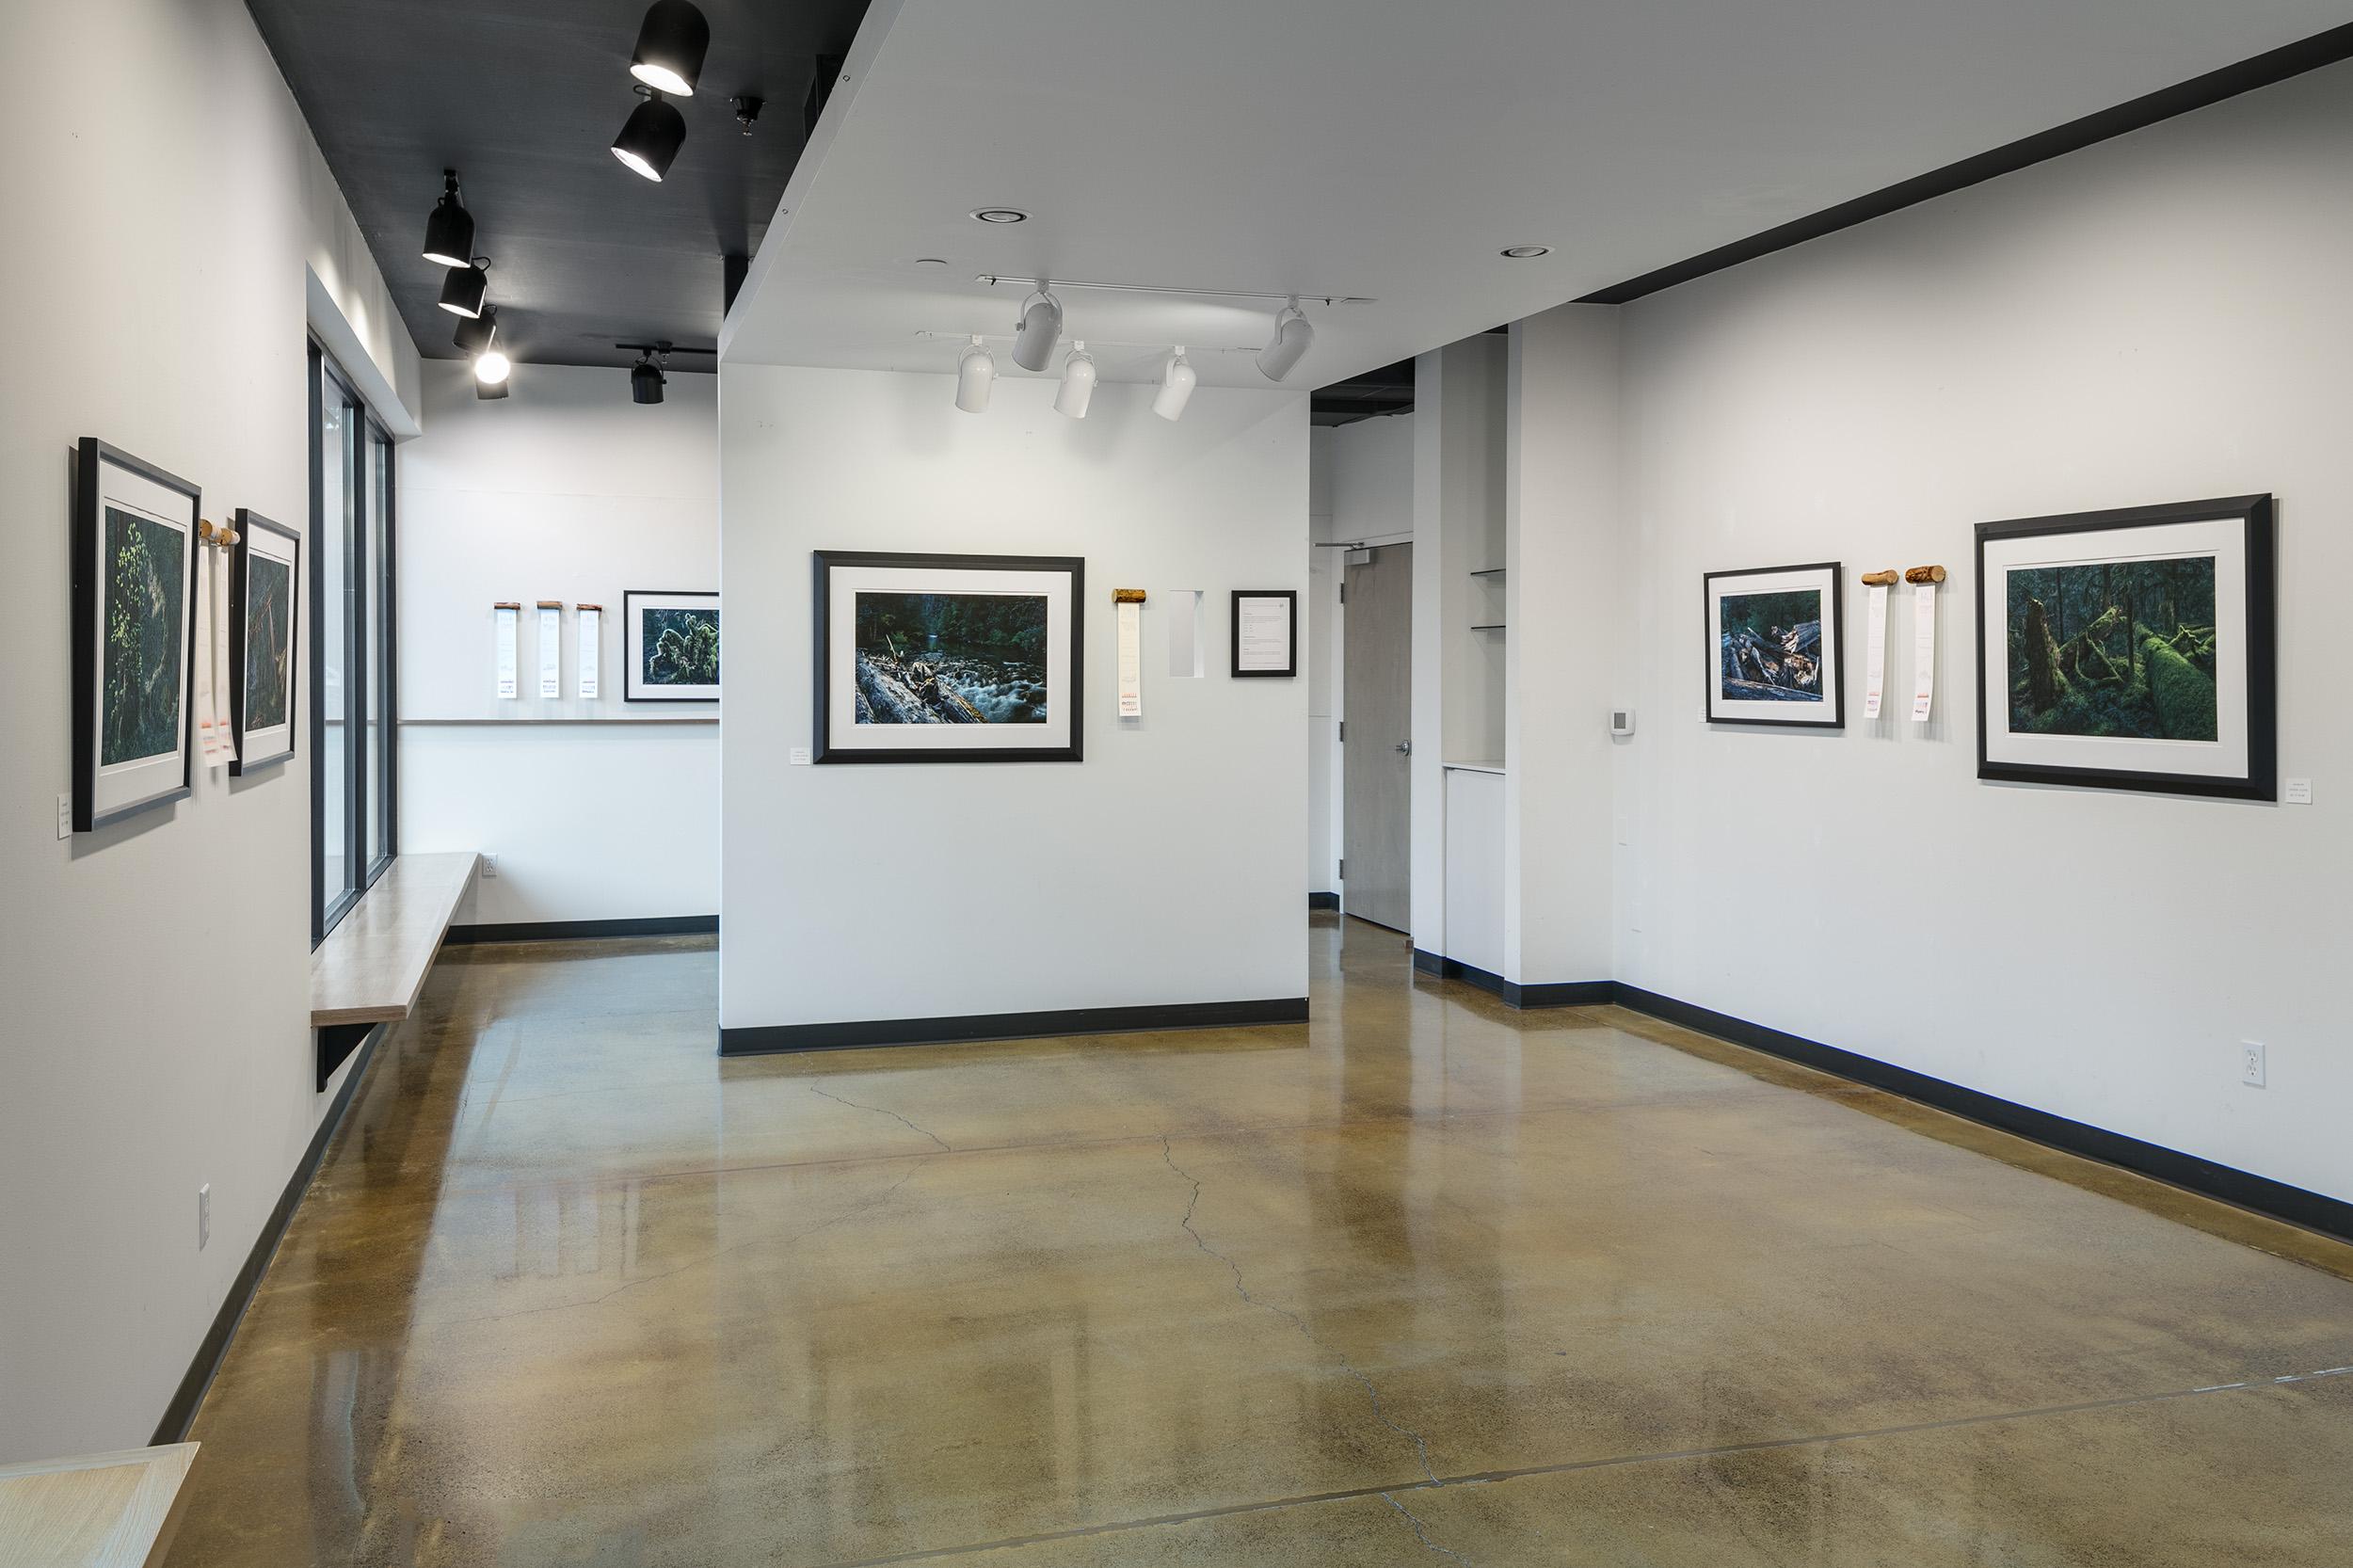 Truckenbrod Gallery